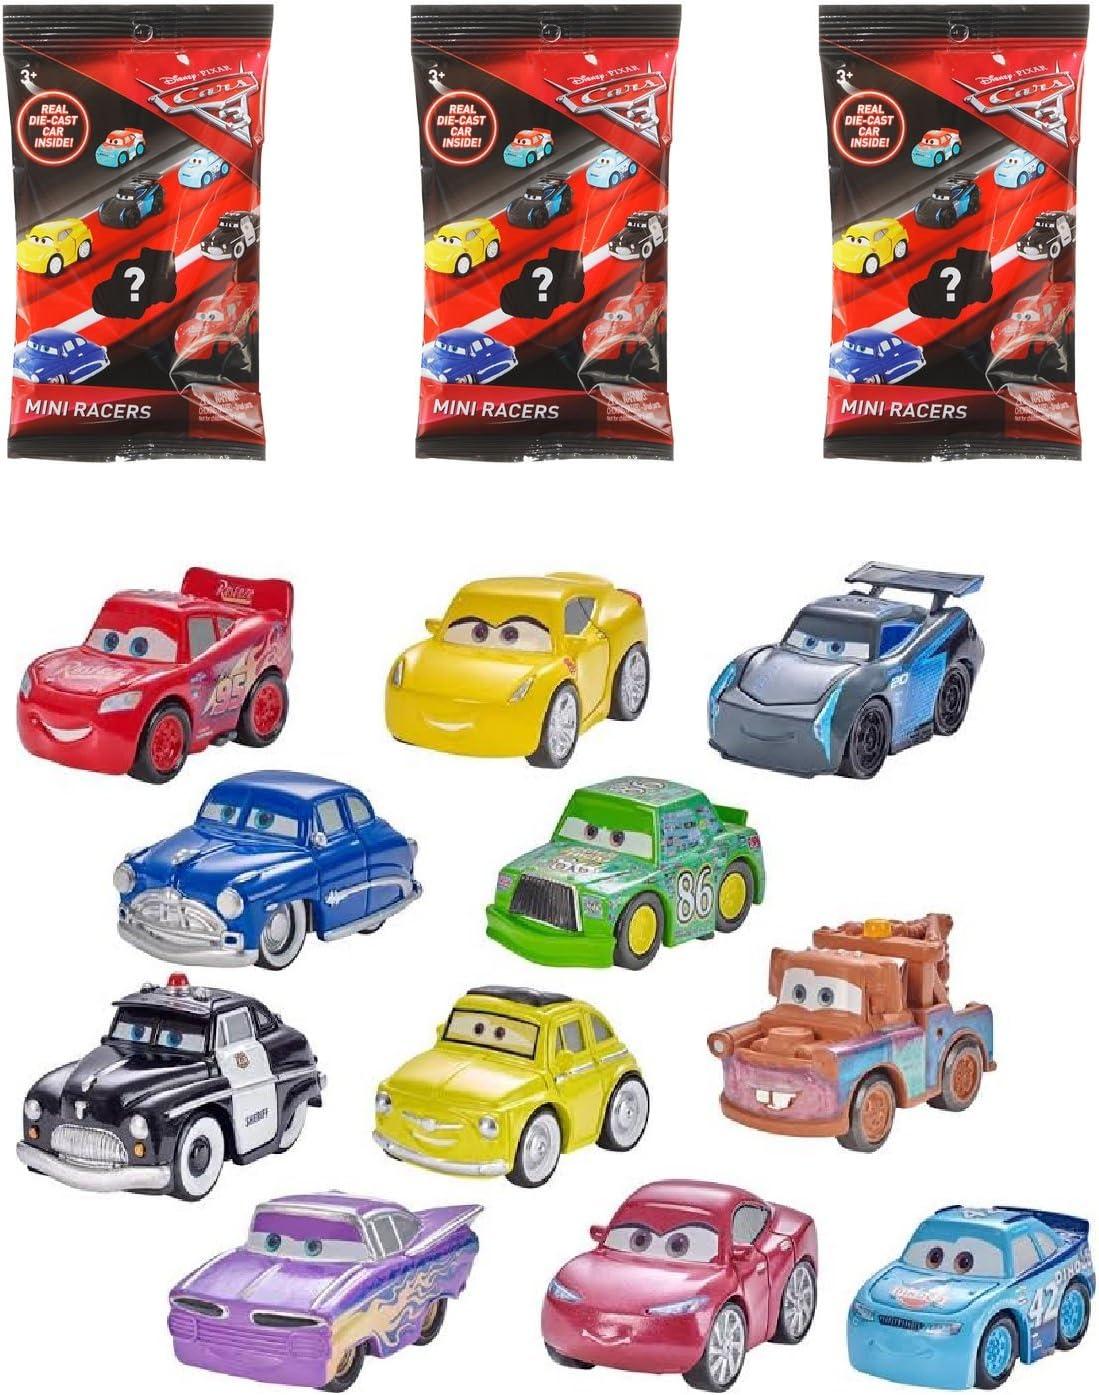 Disney Pixar Cars 3 Mini Racers Véhicules Set de 10 Cars